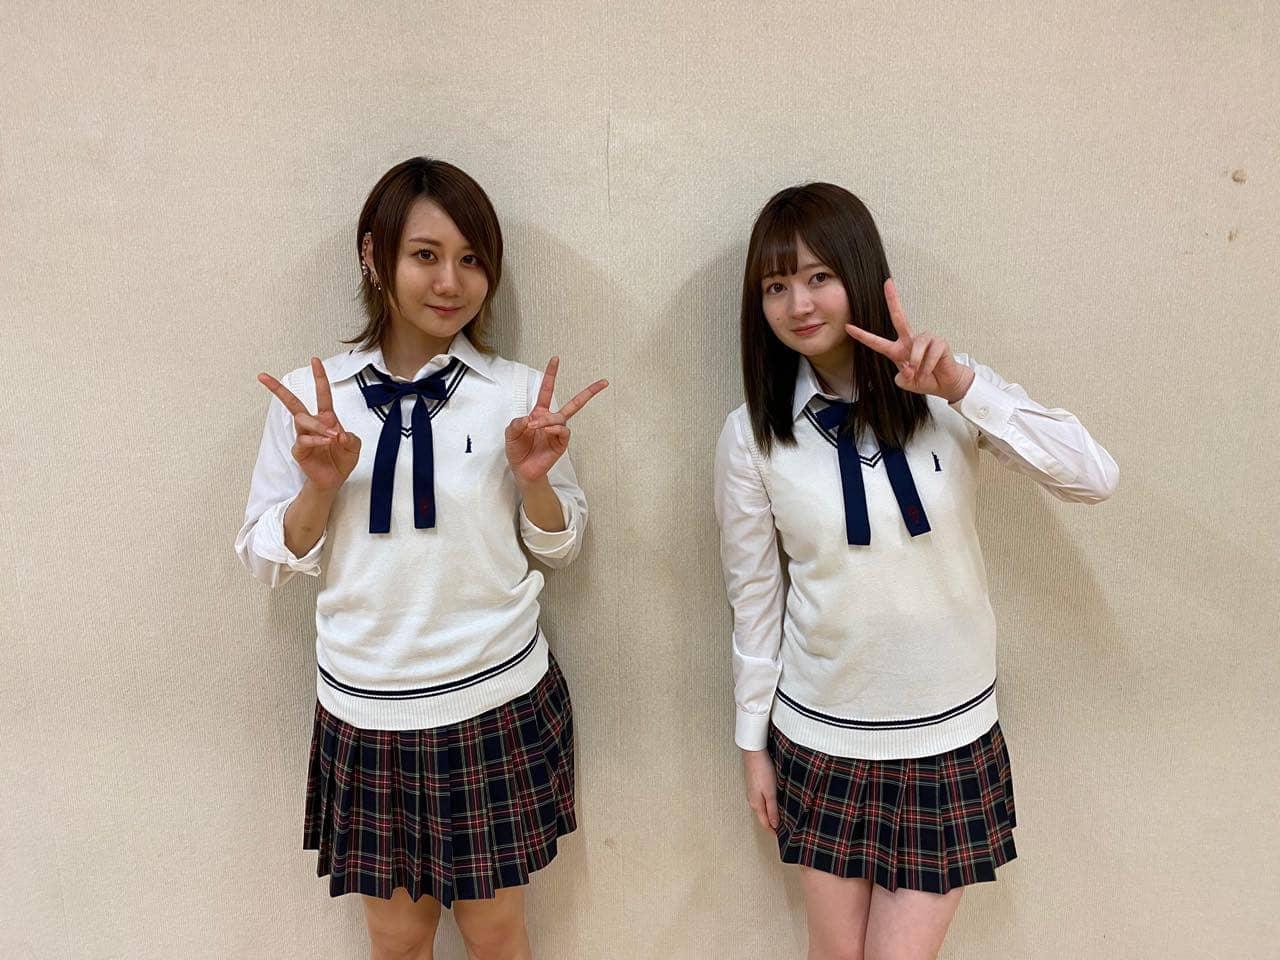 「SKE48は君と歌いたい 特別編」江籠裕奈&古畑奈和がレッスン場で語り合う